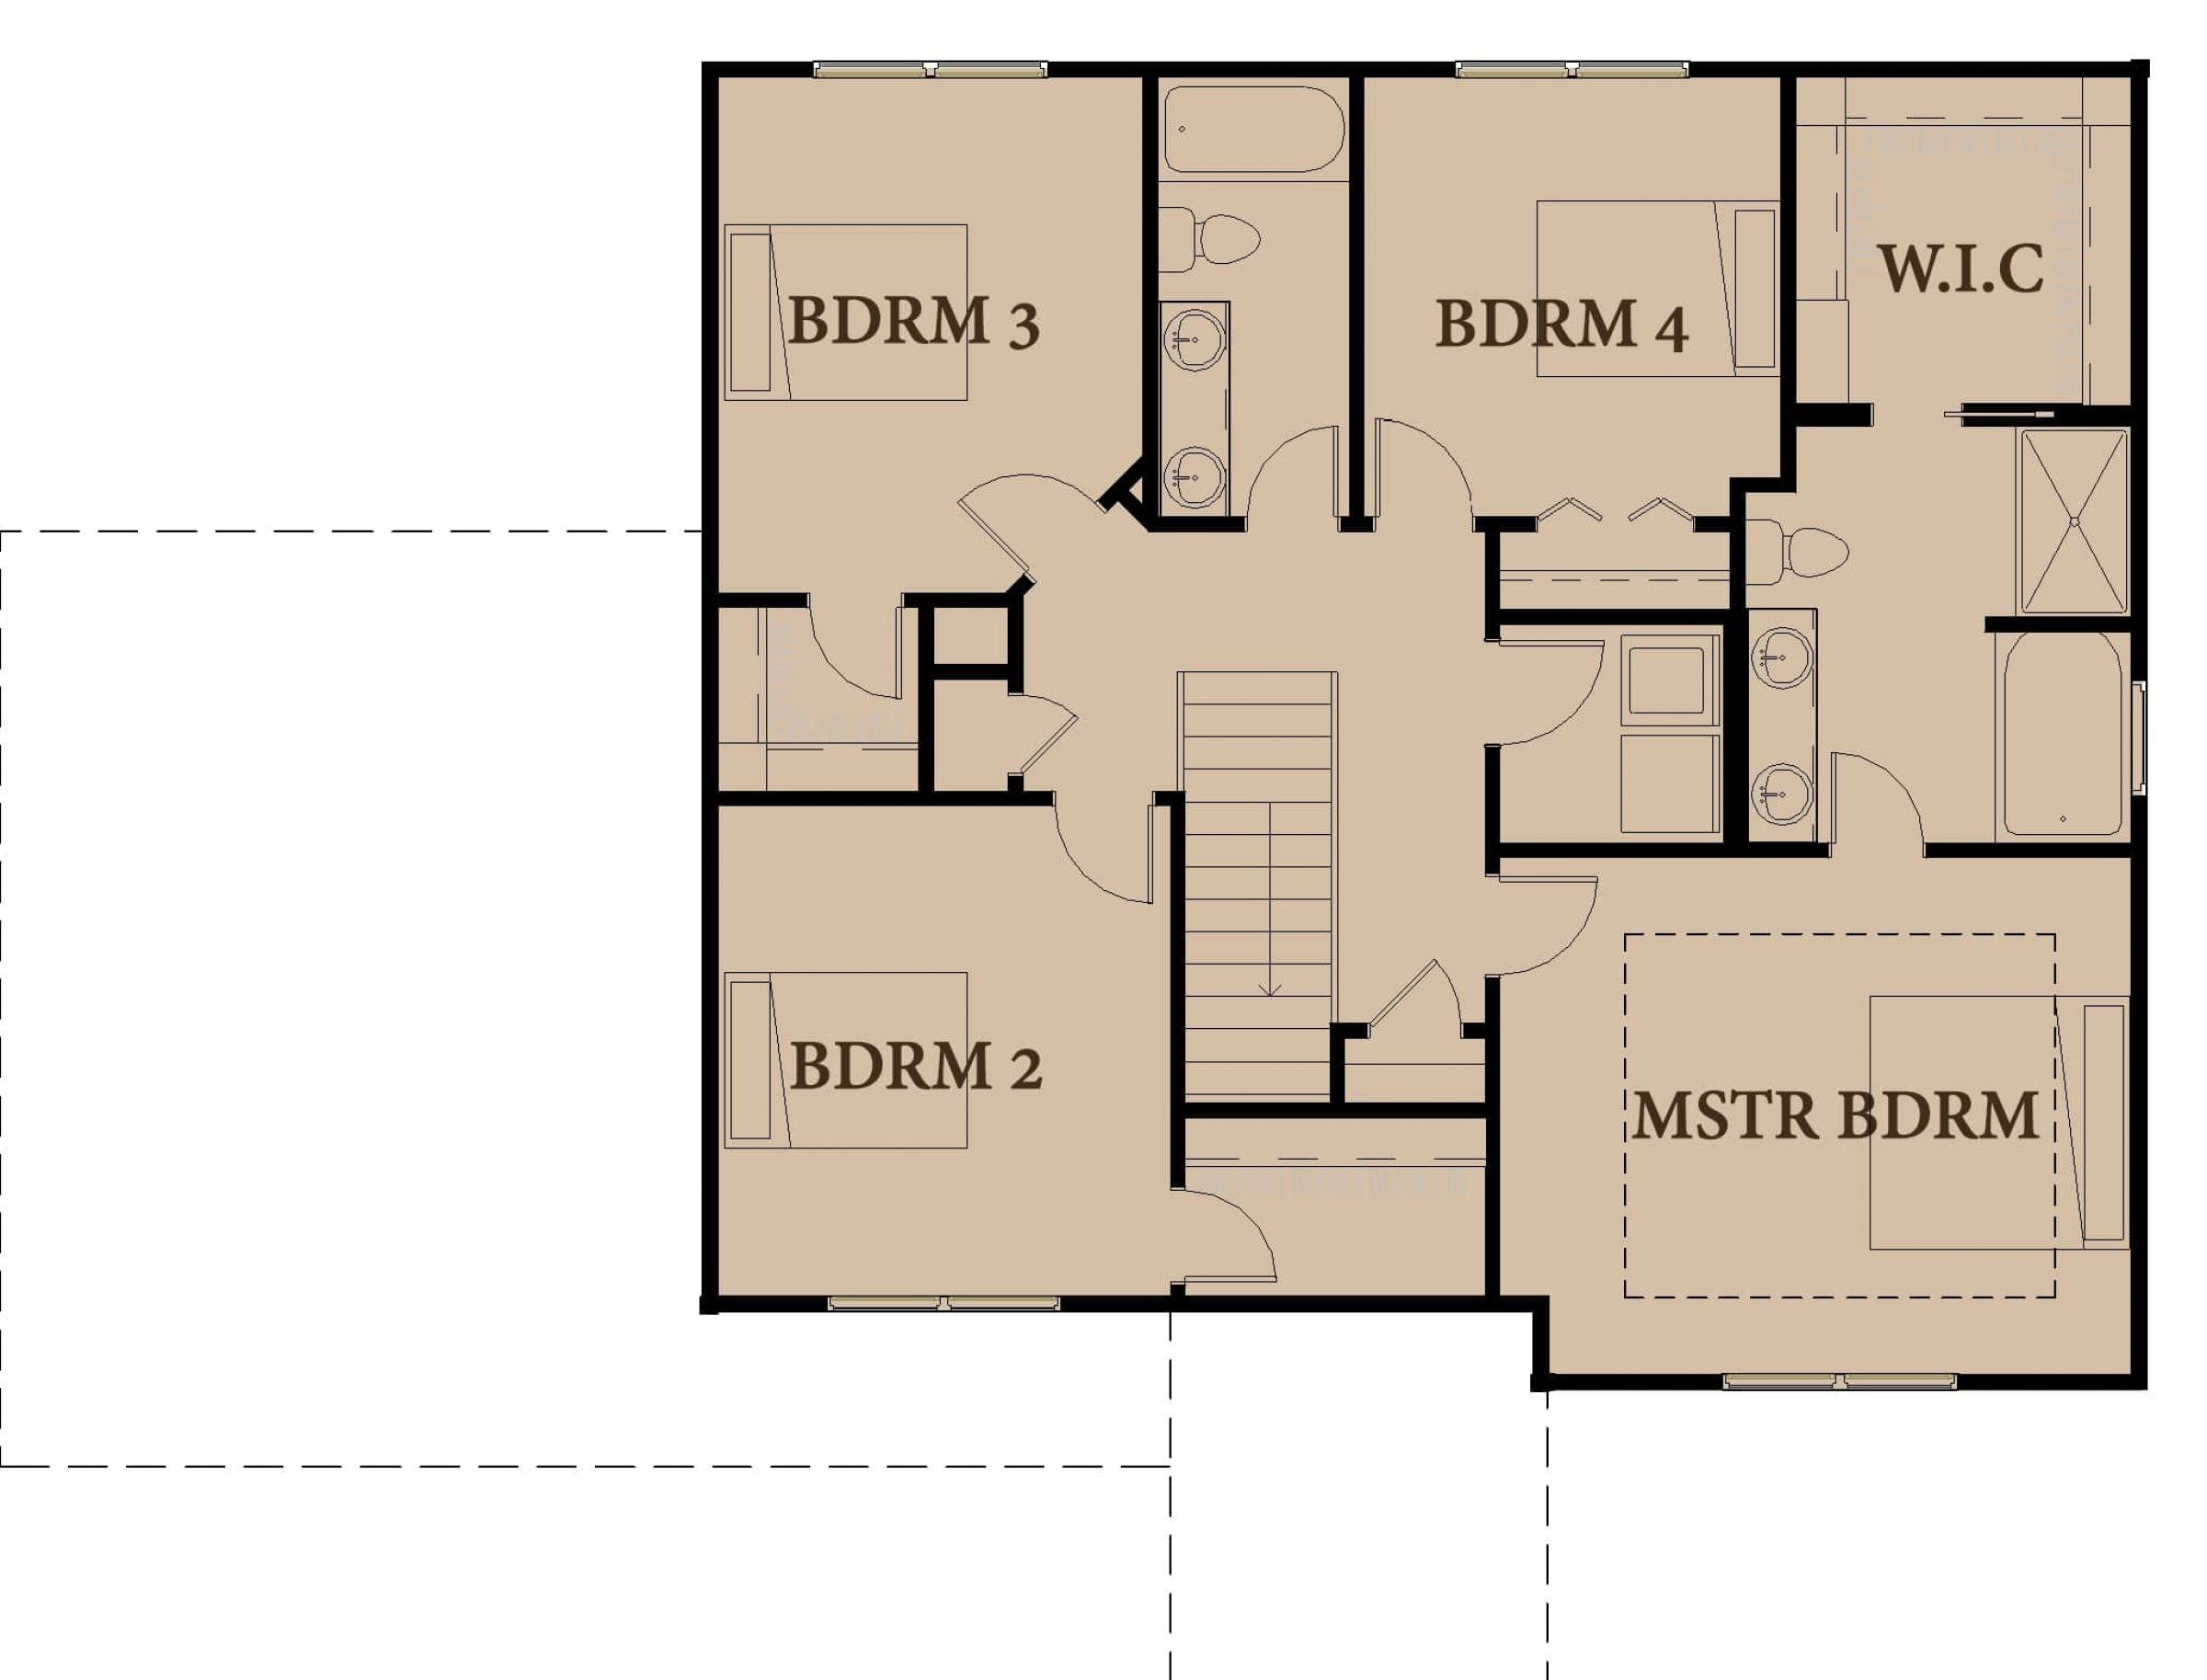 residential-warren-county-iowa-1-acres-listing-number-15672-1-2021-08-05-224731.jpg